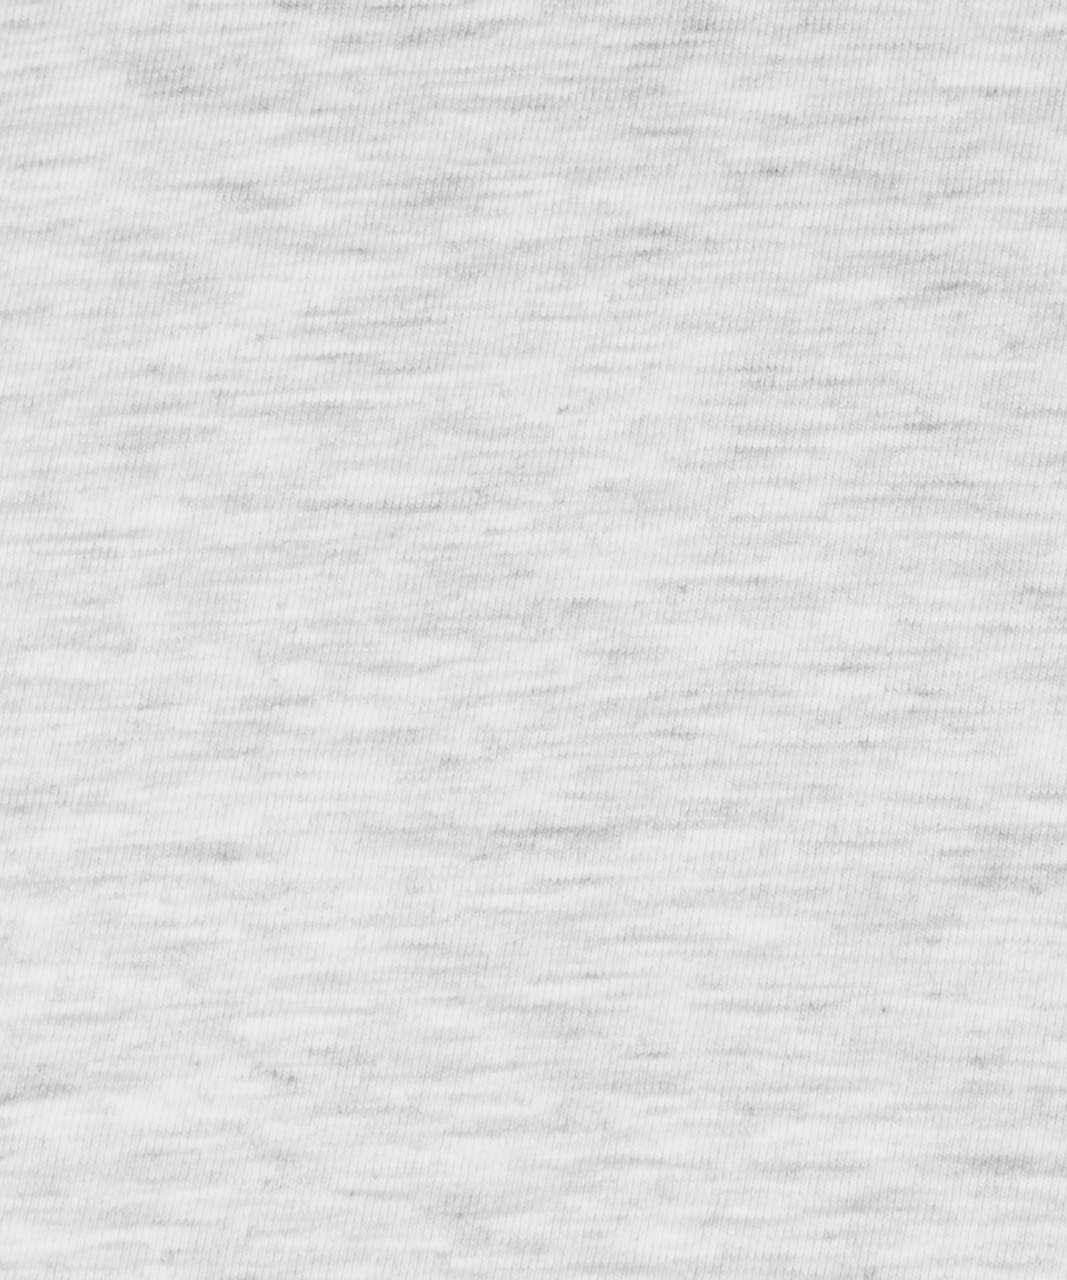 Lululemon Love Tee V - Heathered Core Ultra Light Grey